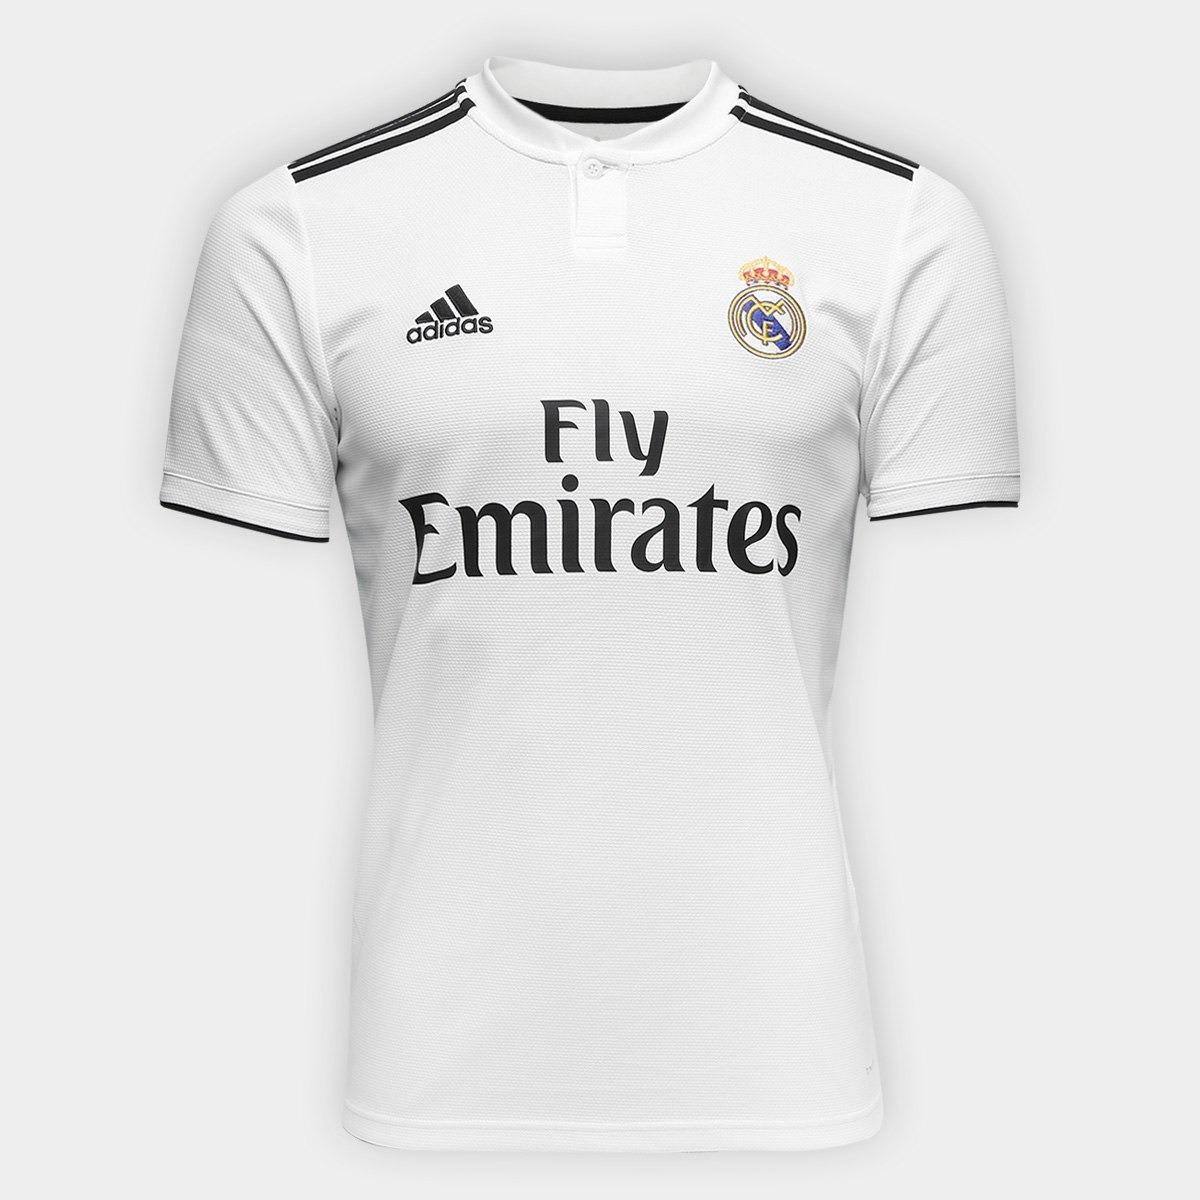 Recebendo Milagre Bonita Camisa Oficial Real Madrid 2019 Pxm Pt